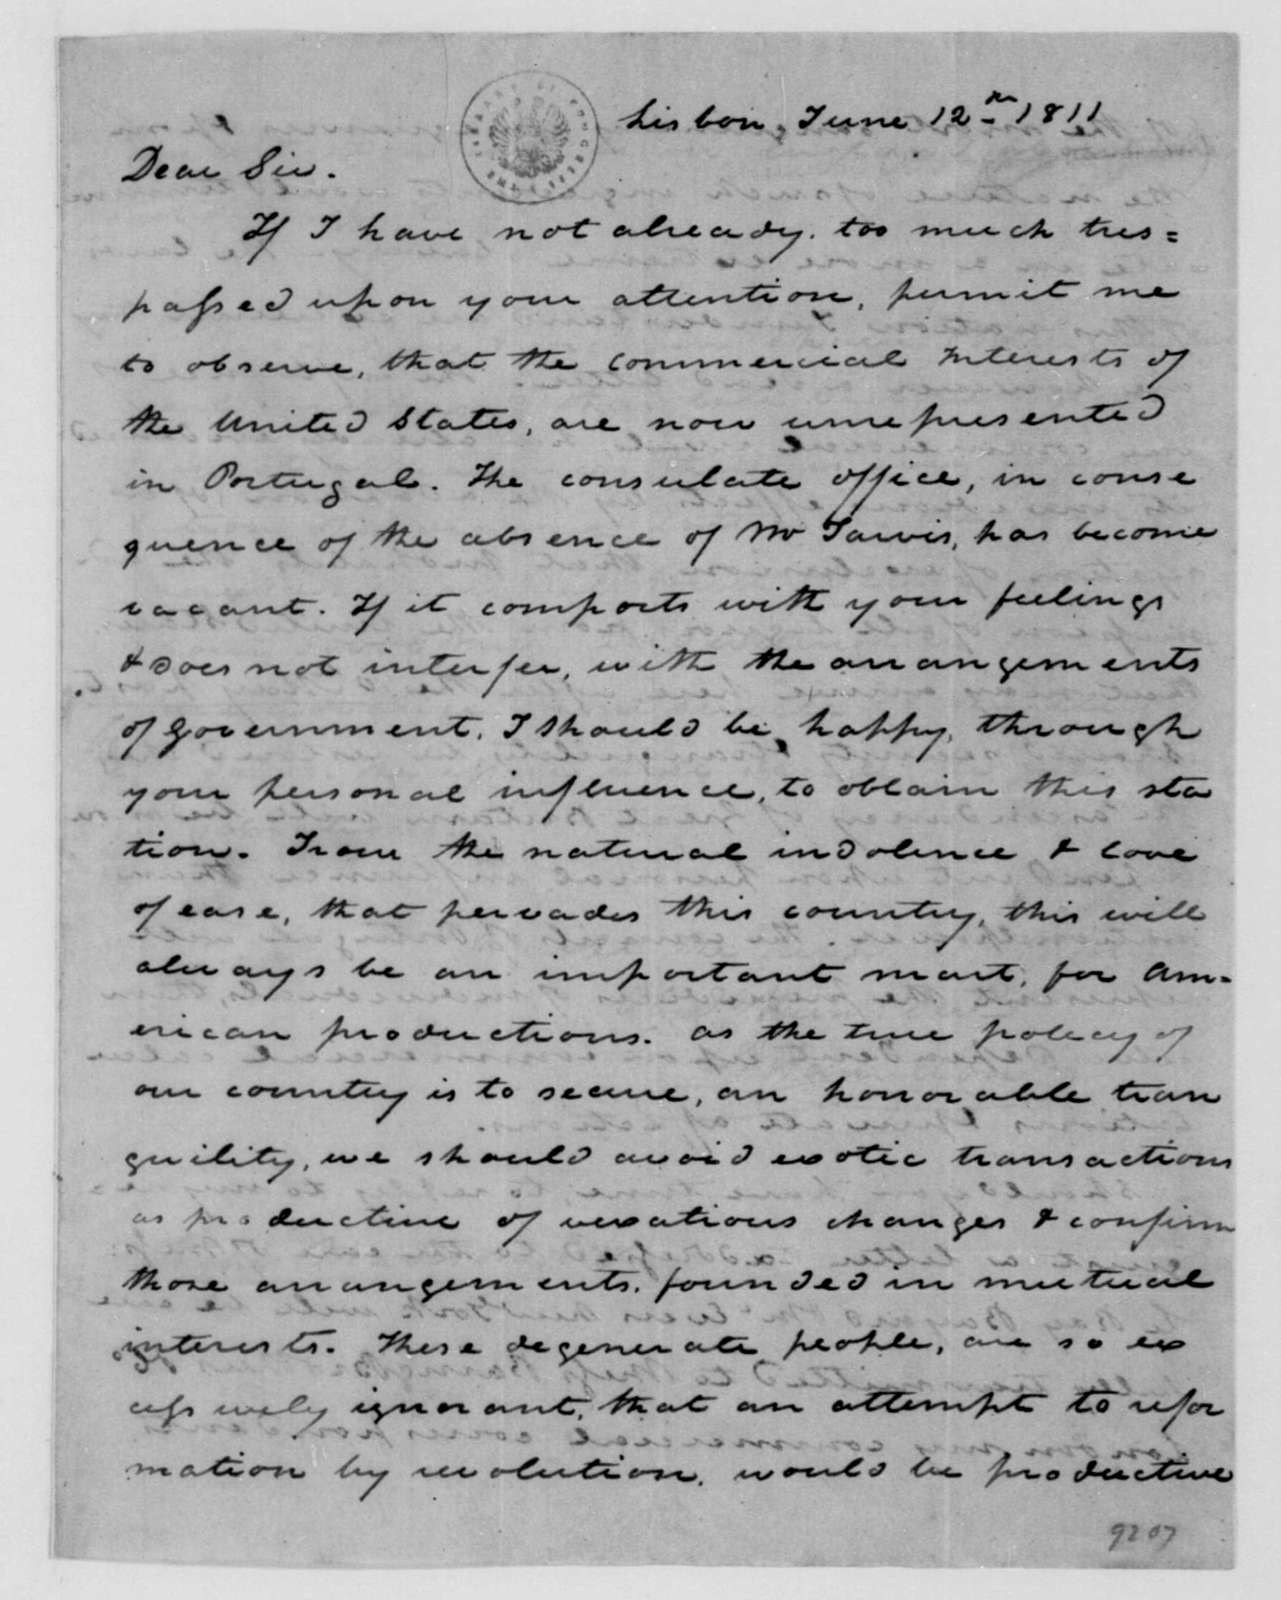 Alexander Hamilton to James Madison, June 12, 1811.